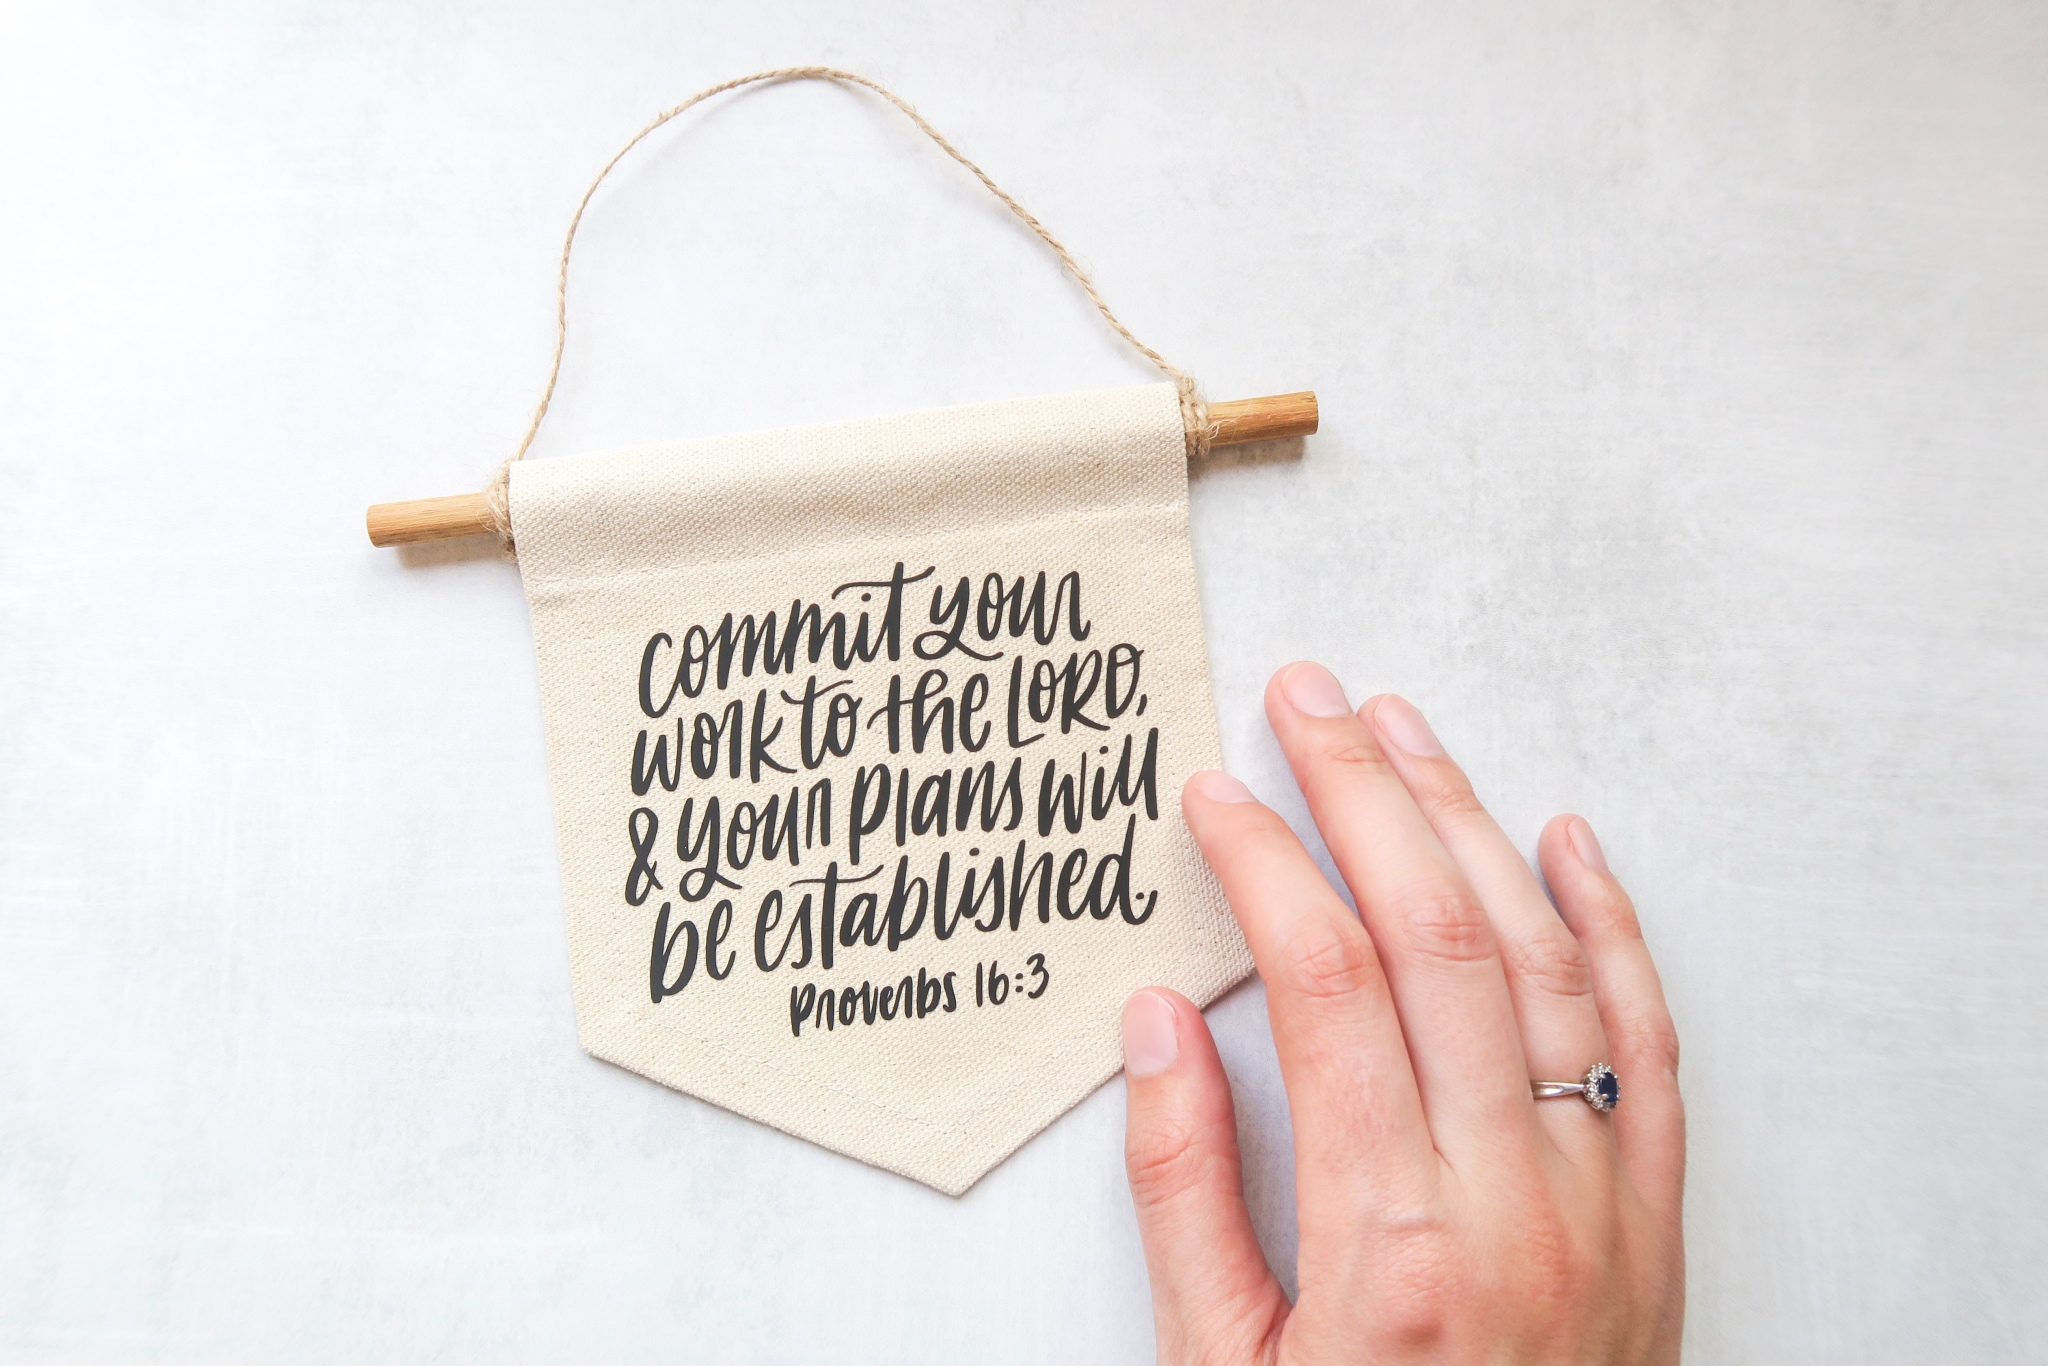 Lauren_Ibach_Proverbs 16.3